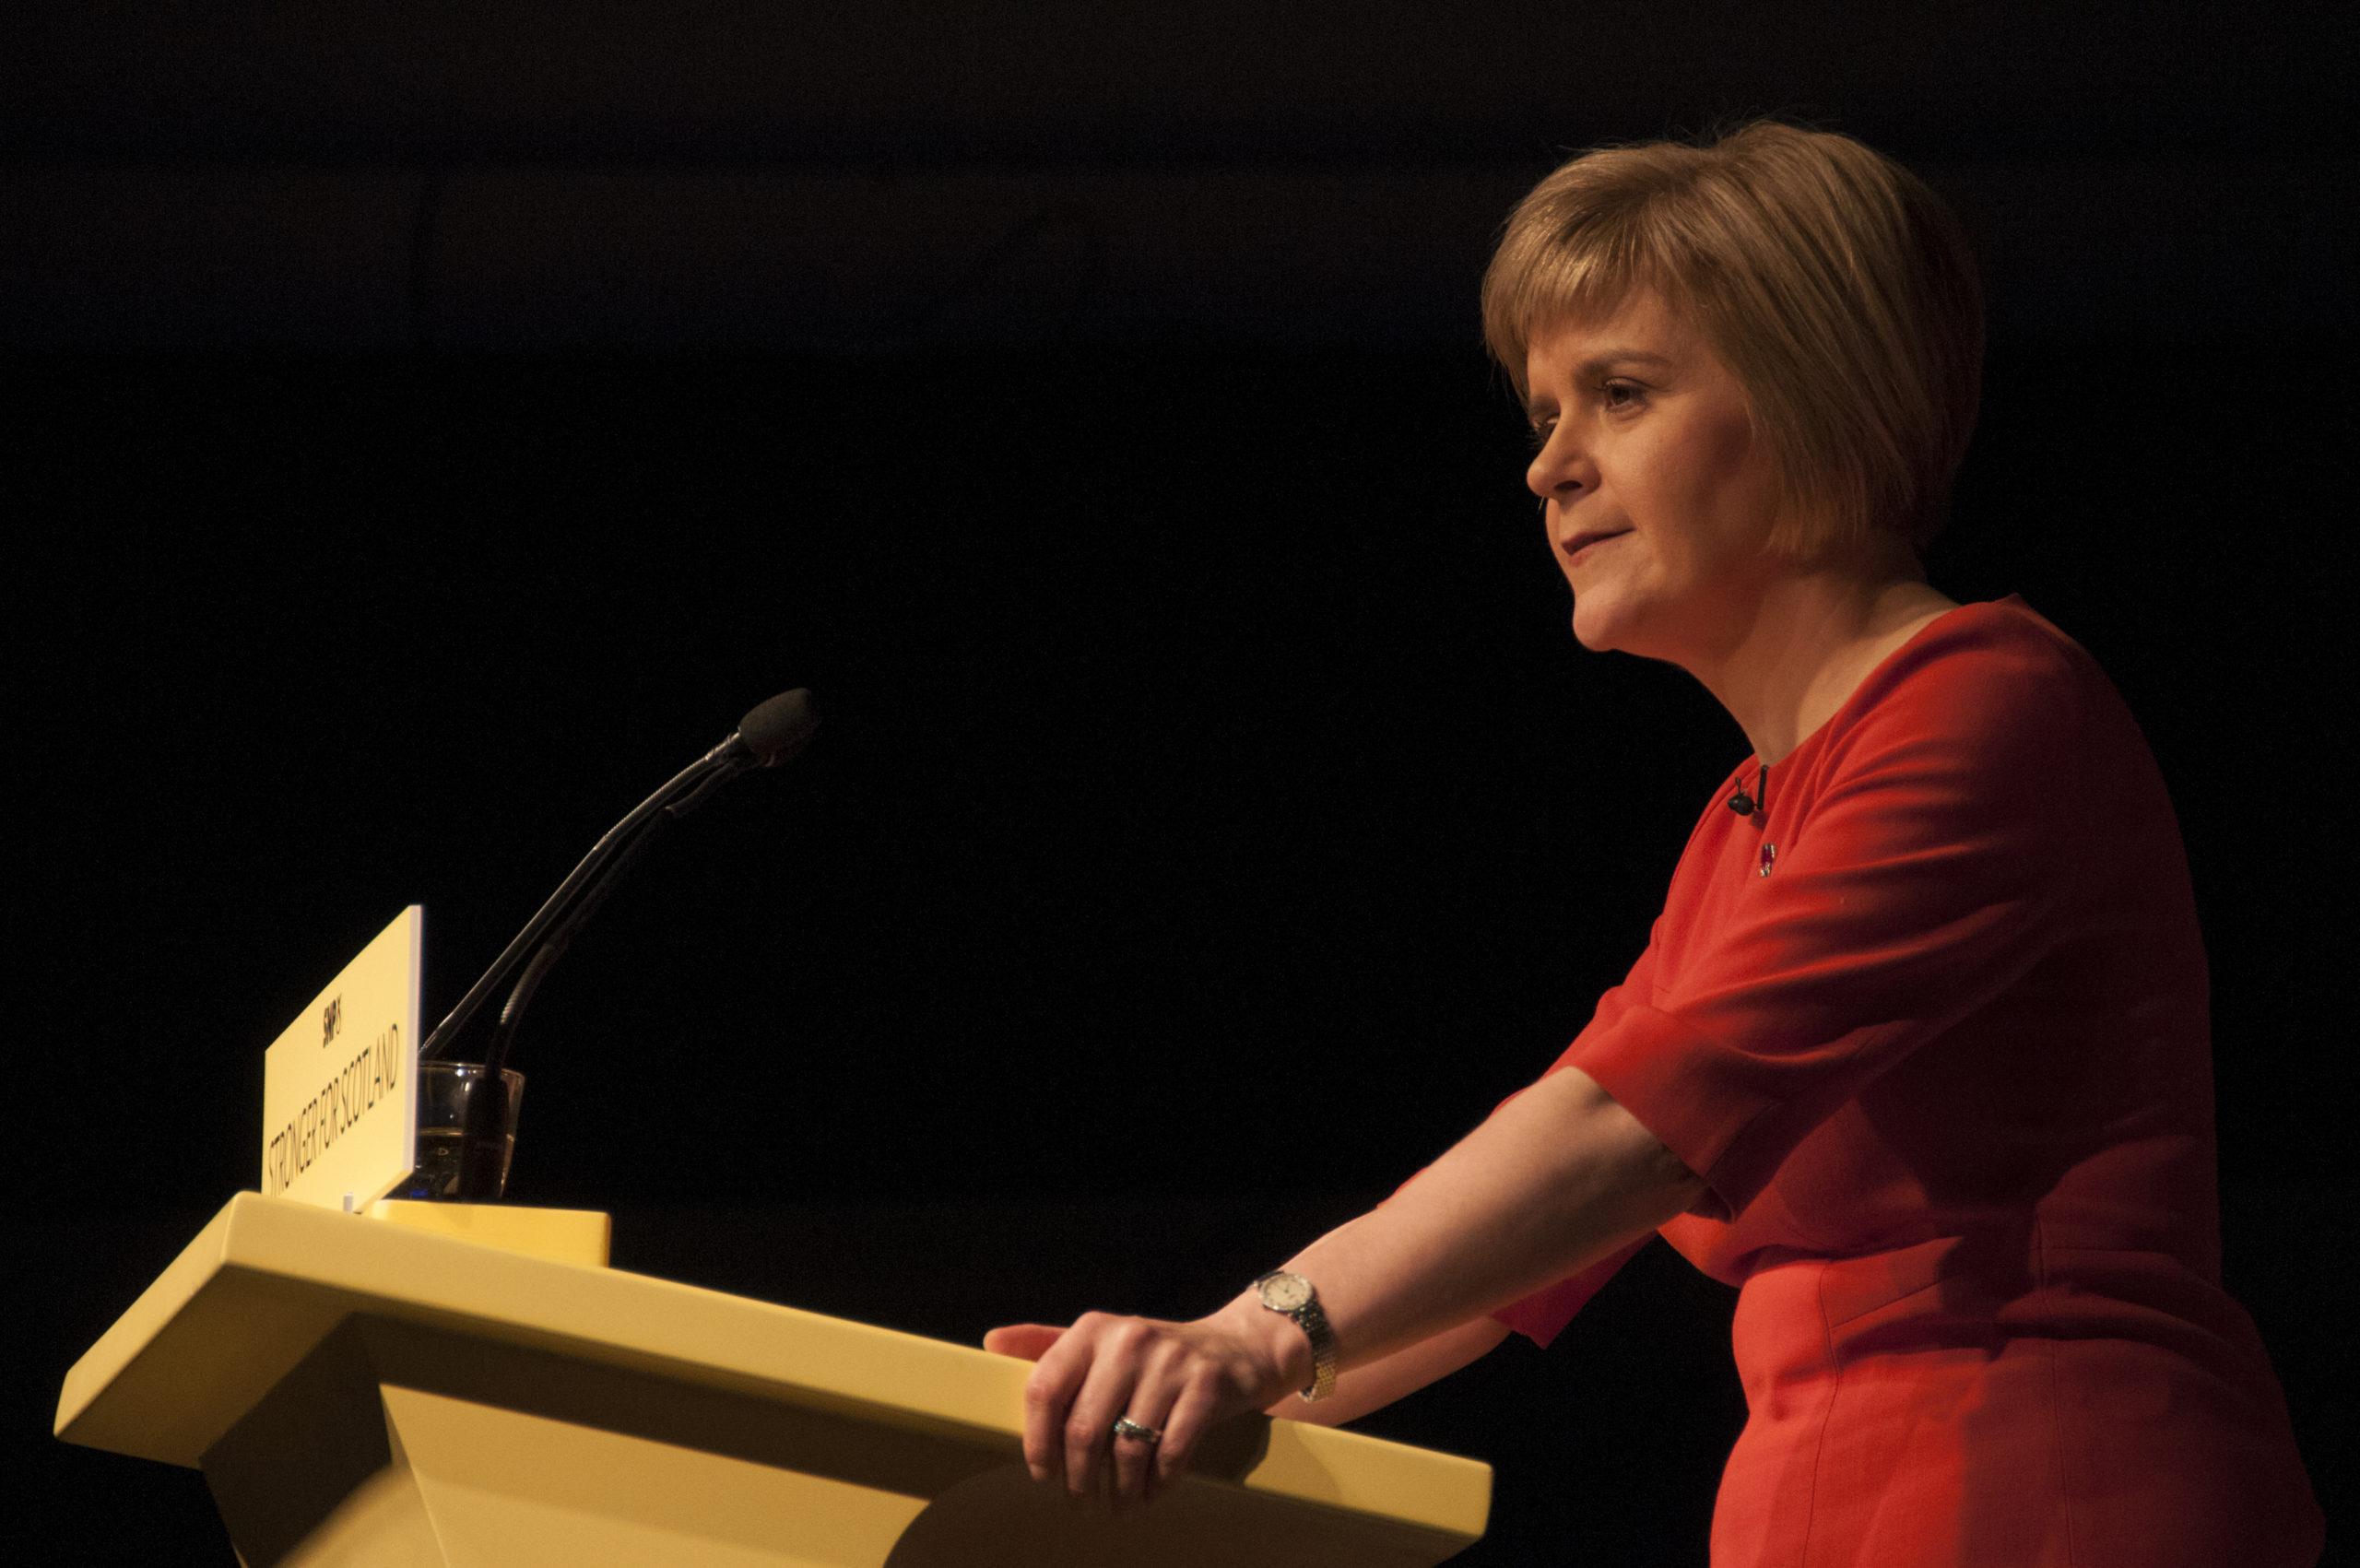 Scottish construction moves to next phase of restart